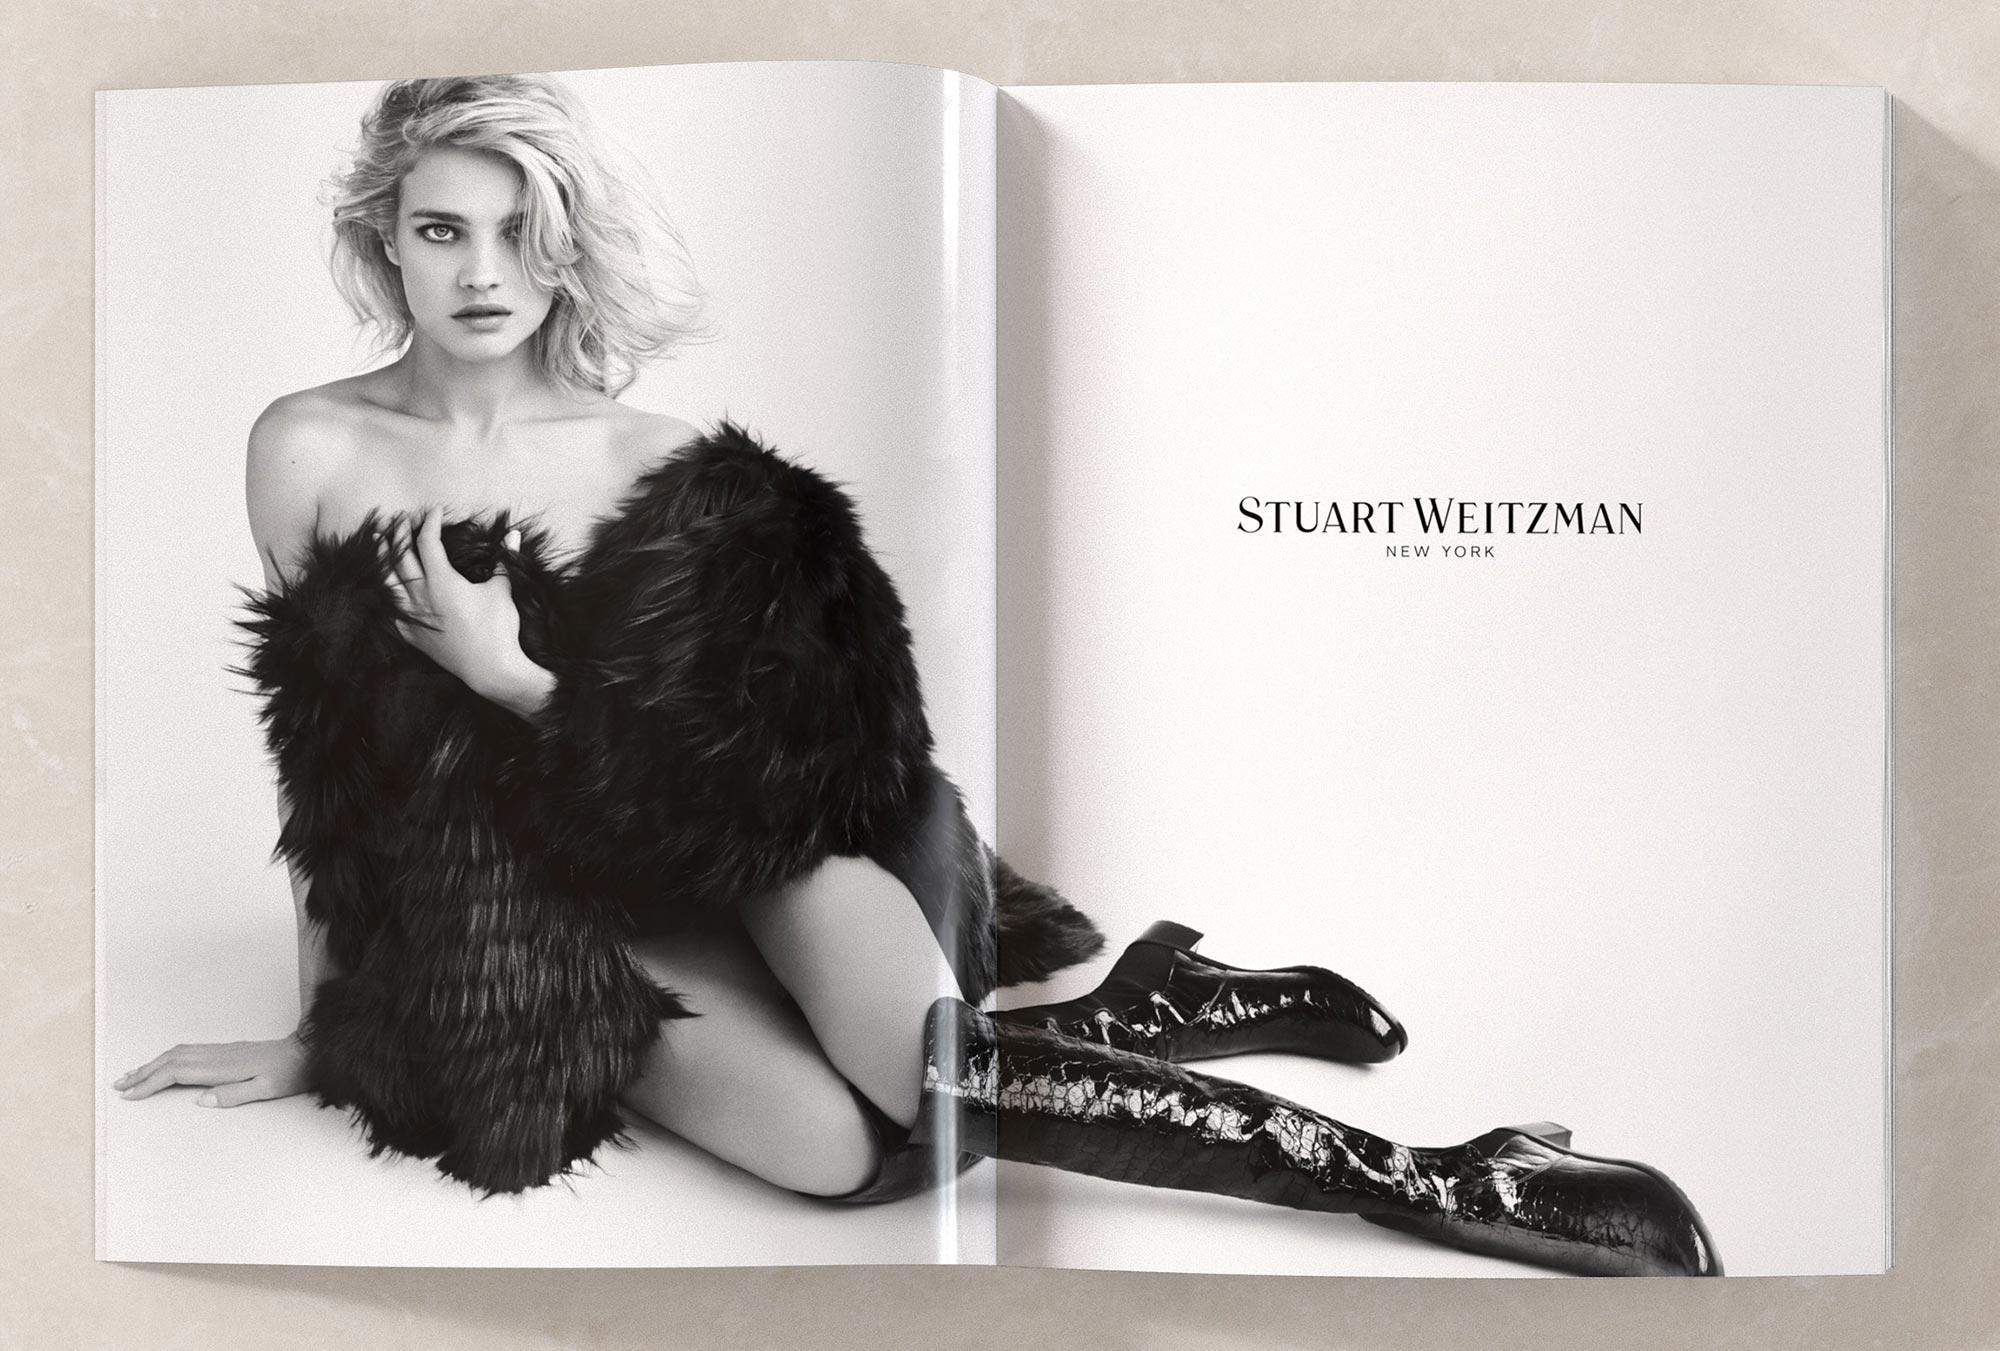 Art Direction of model Natalia Vodianova for Shoe Brand Stuart Weitzman